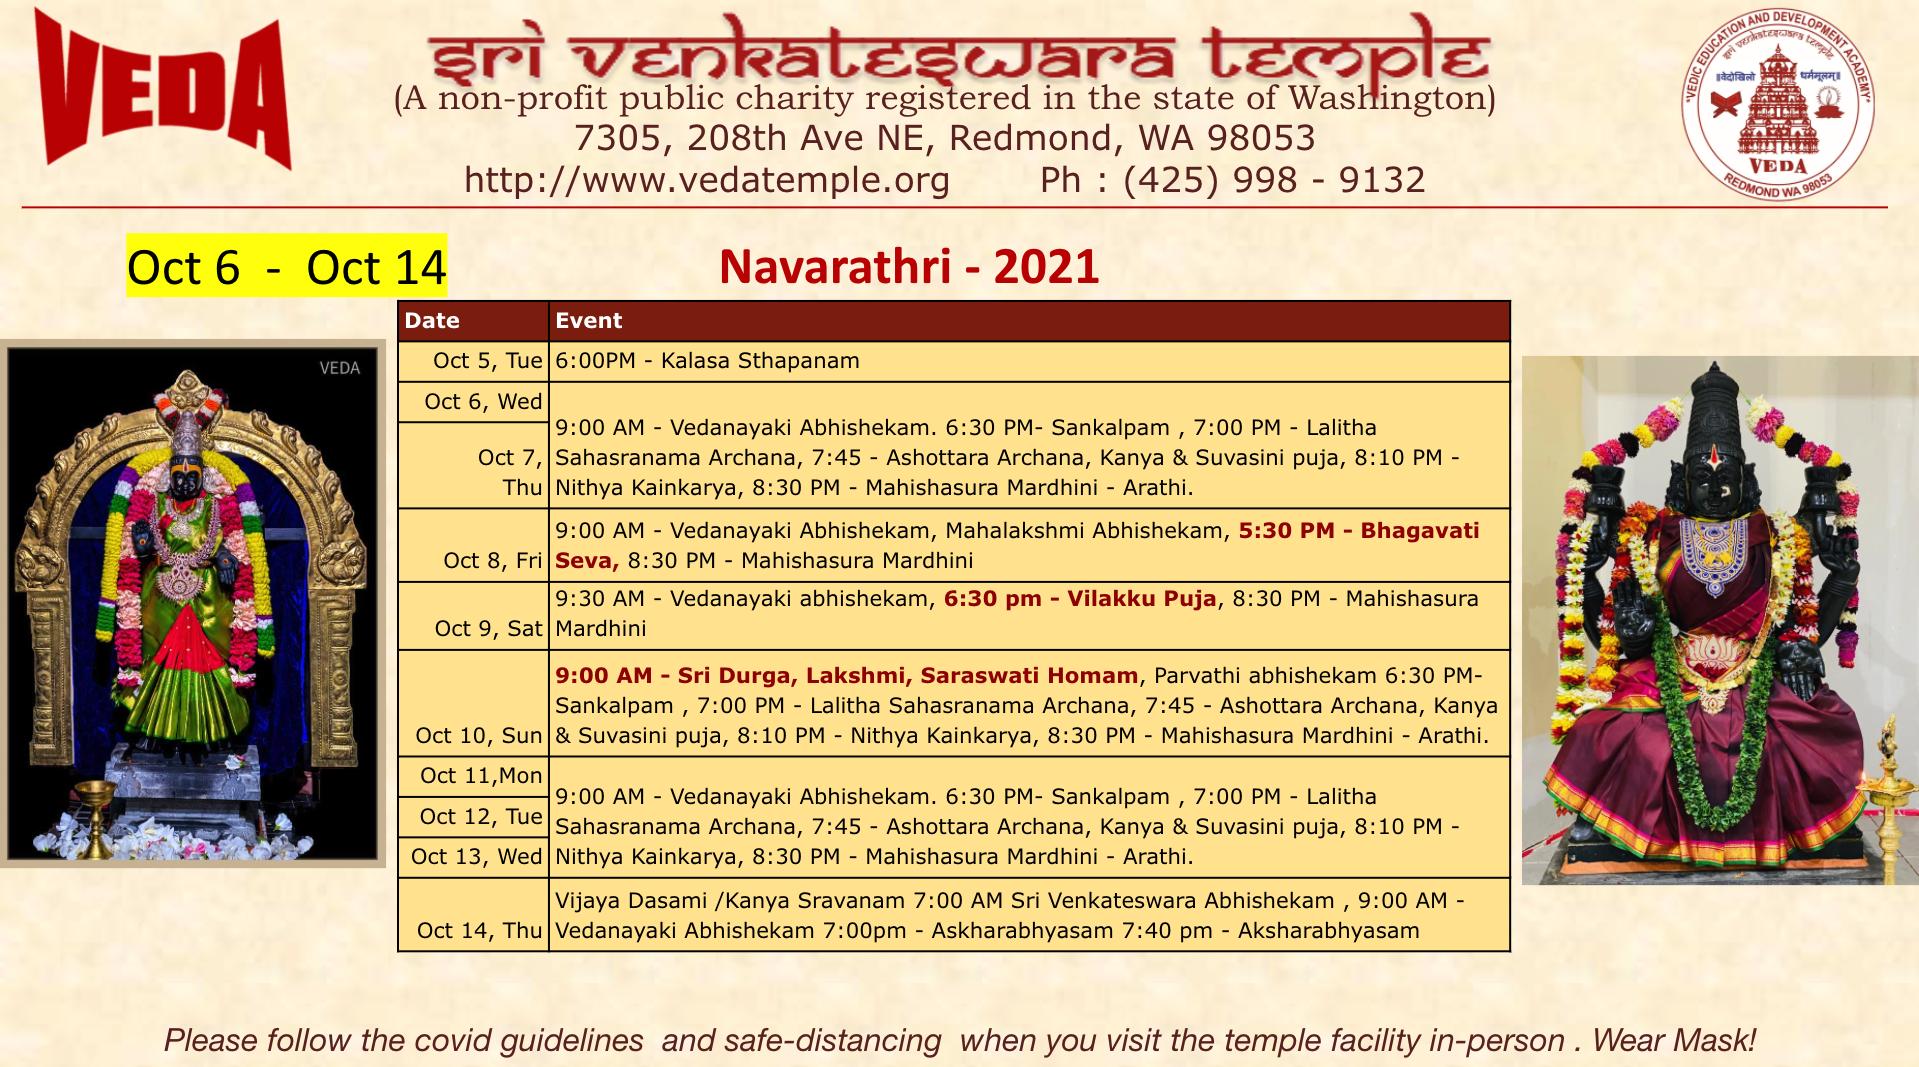 Navarathri - 2021